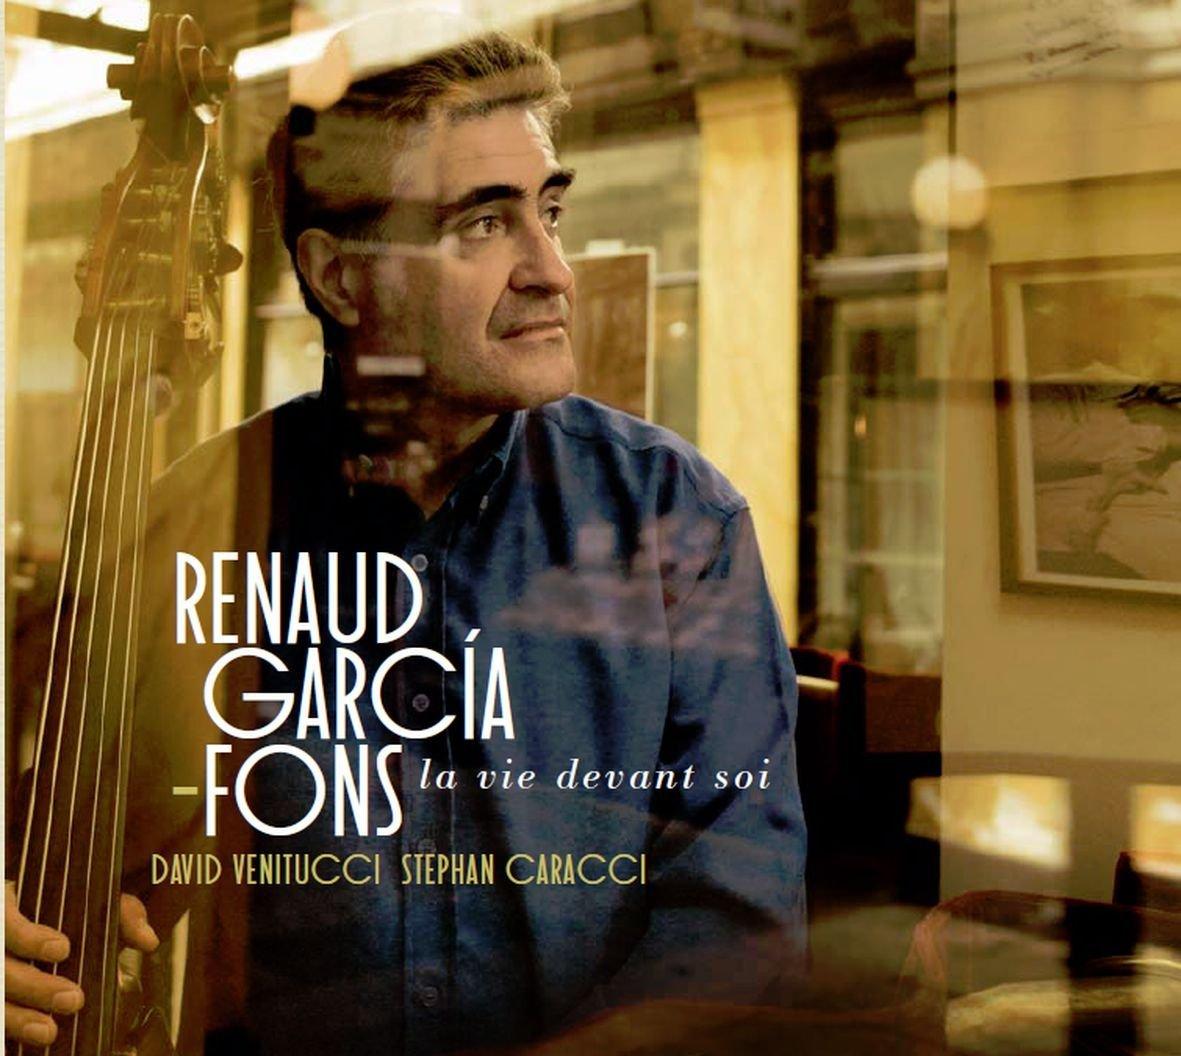 La vie devant soi Renaud Garcia-Fons, composition & contrebasse Stephan Caracci, vibraphone & percussions; David Venitucci, accordéon